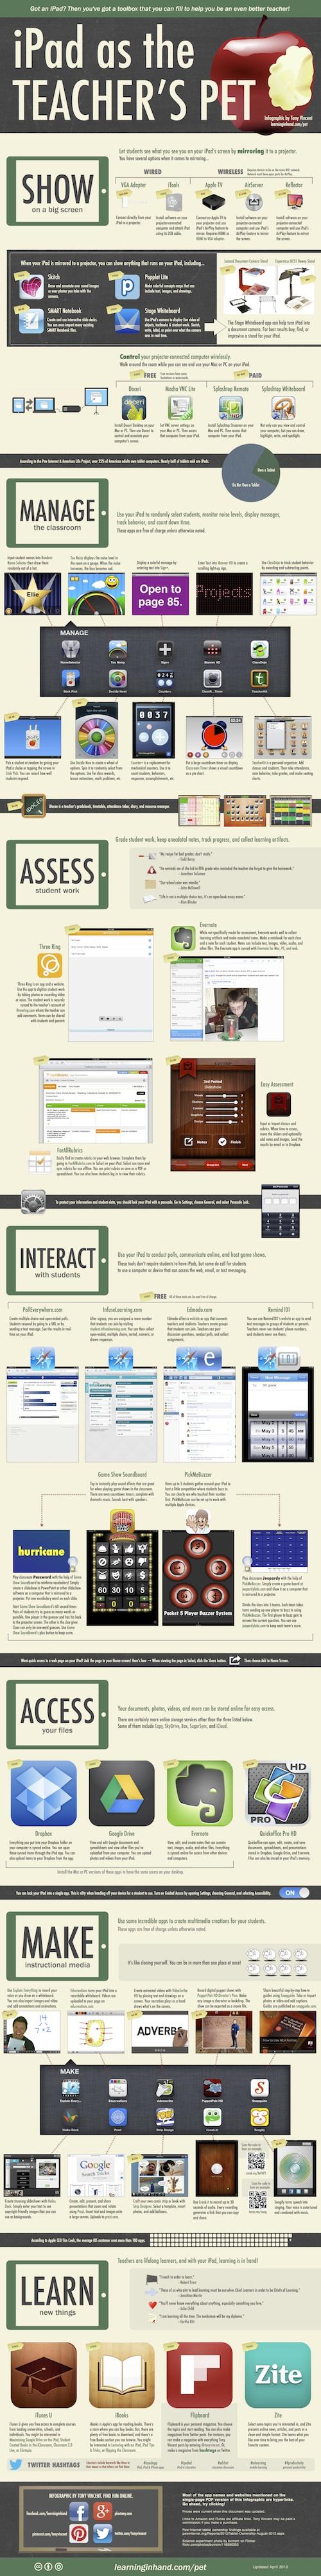 iPad as Teachers Pet.jpg